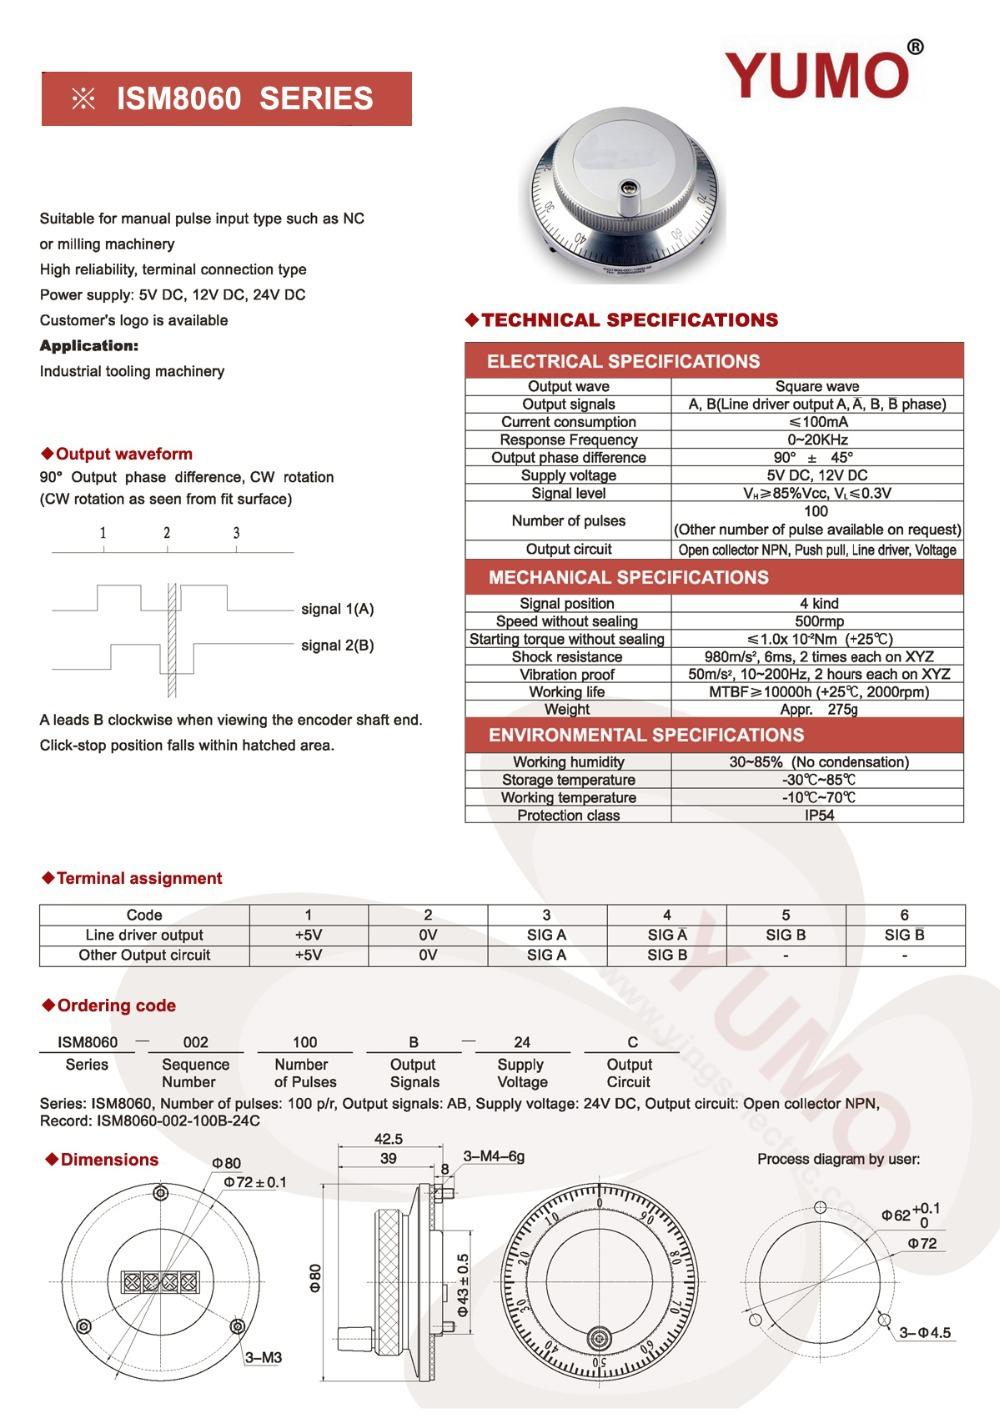 Ism8060 80mm 100 Ppr Pulse 5v Dc Manual Pulse Generator